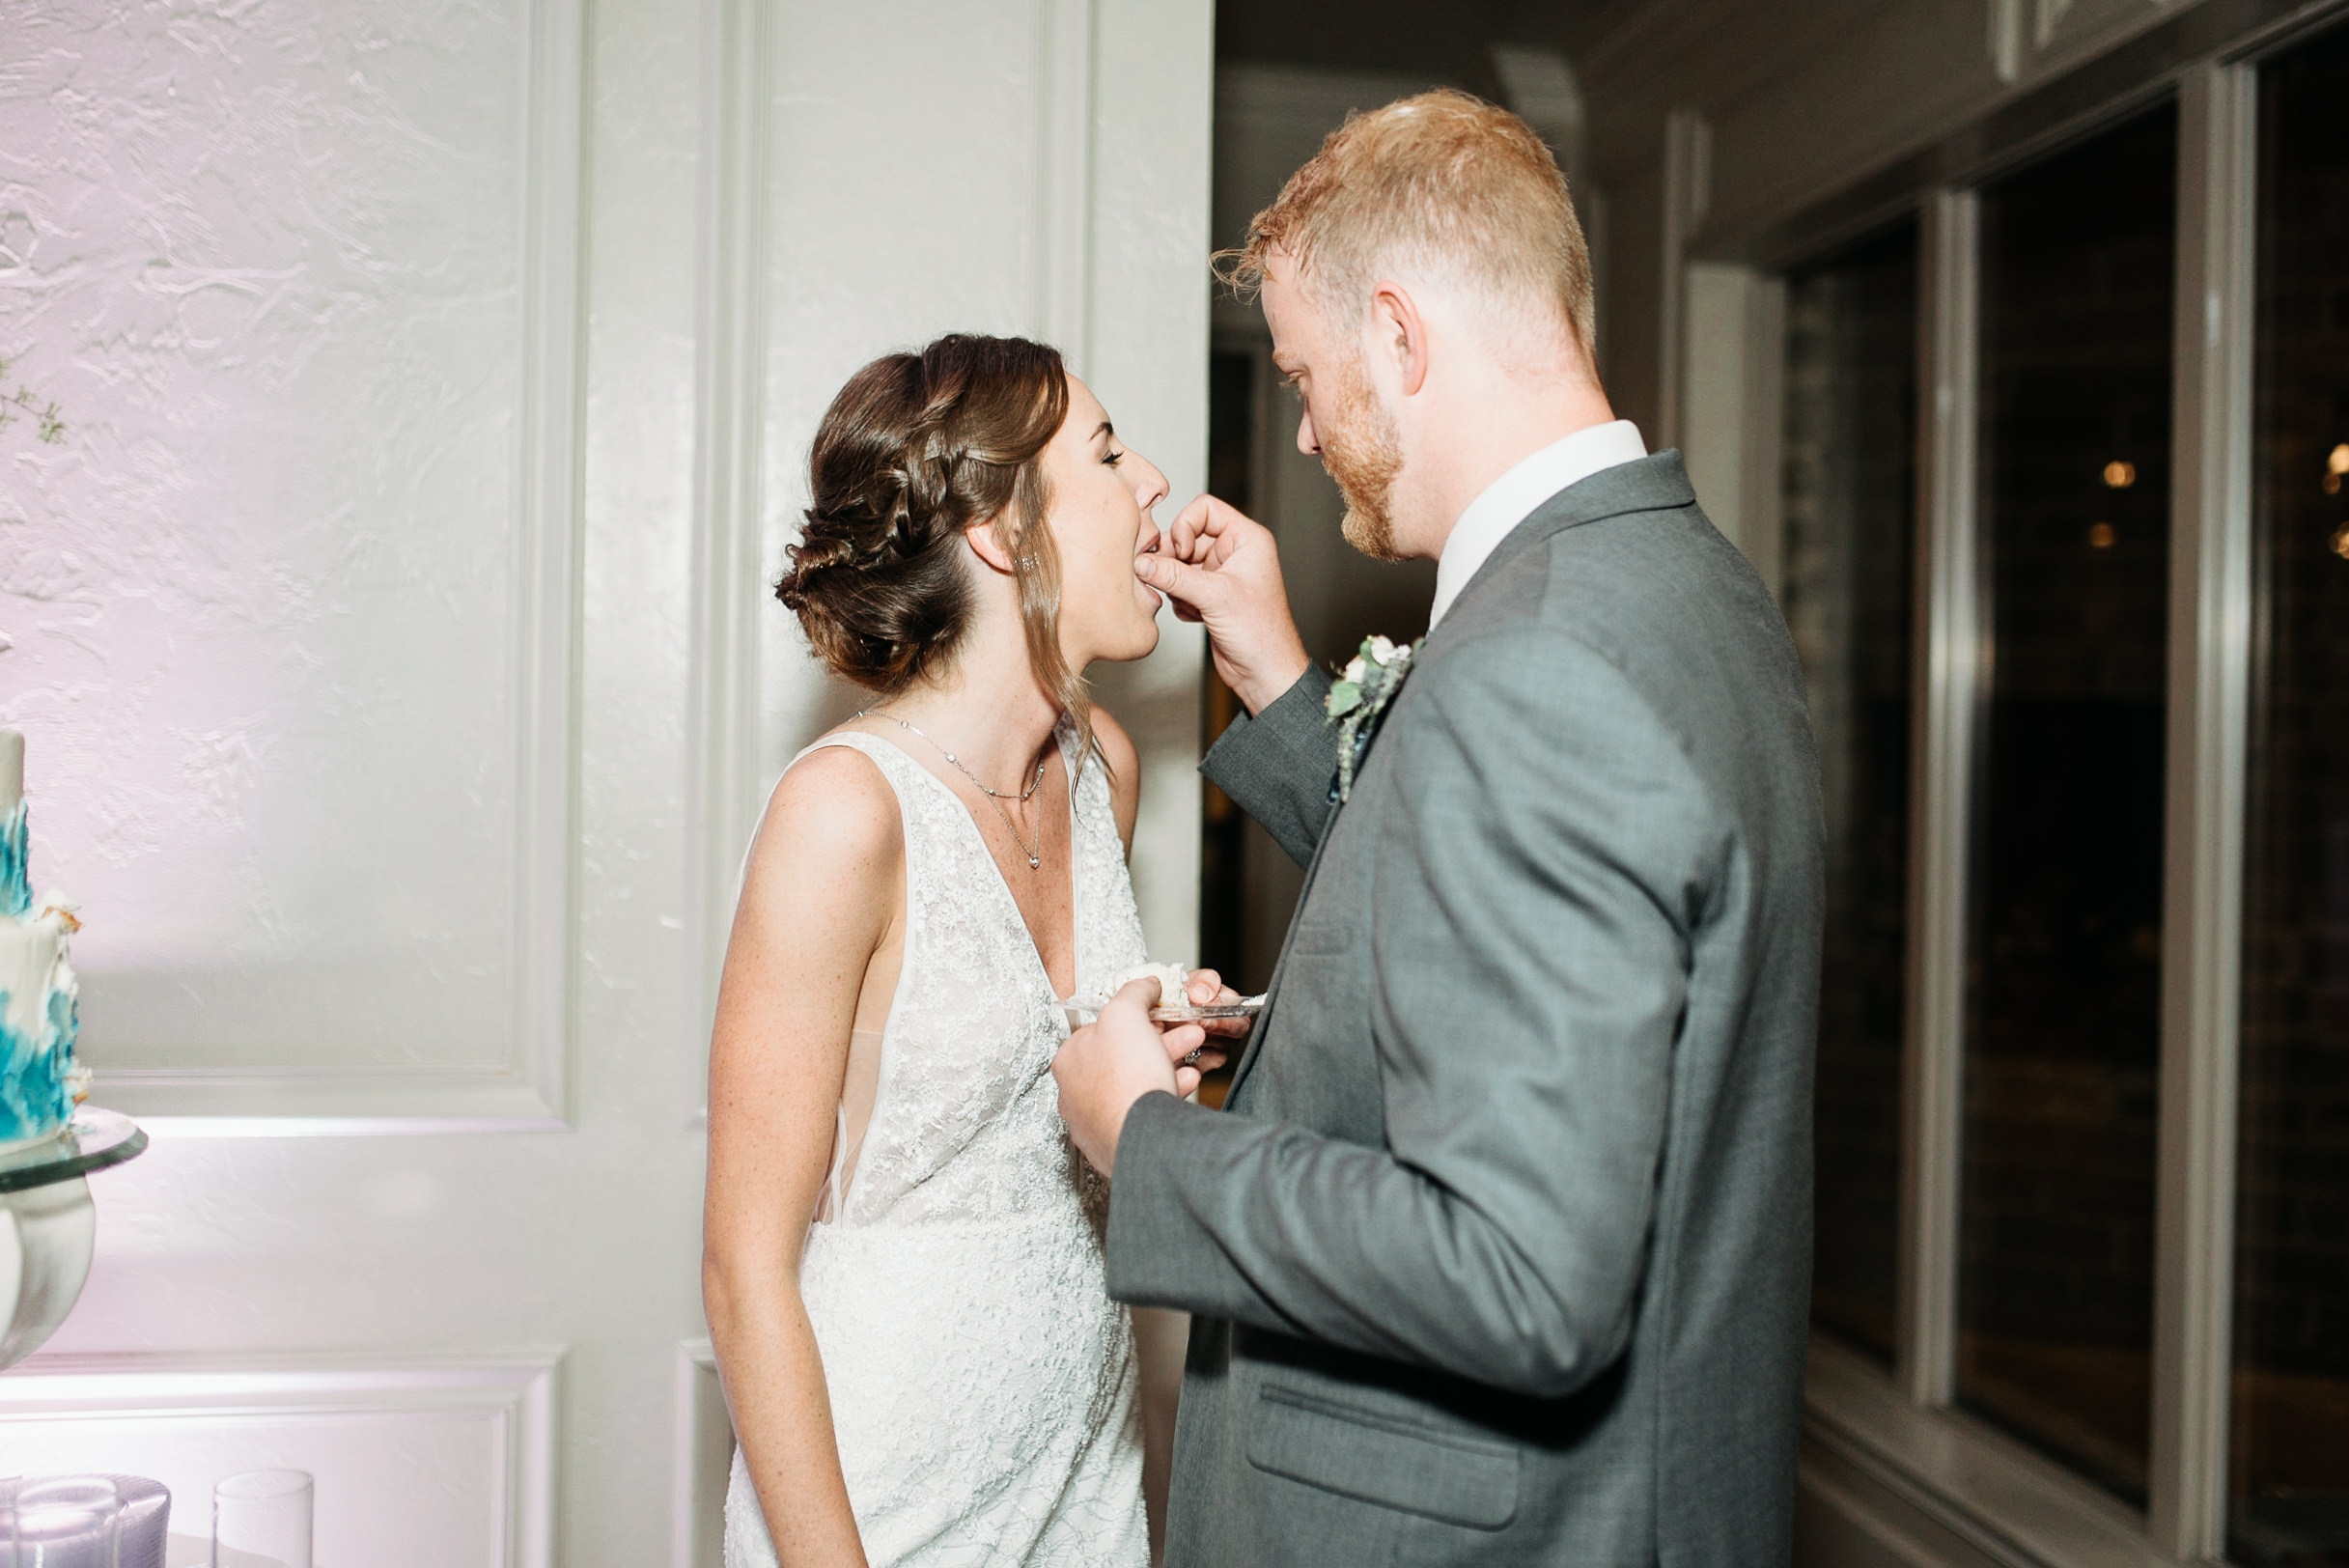 okc-wedding-photographer-coles-garden-wedding-okc-best-wedding-photographers-166.jpg